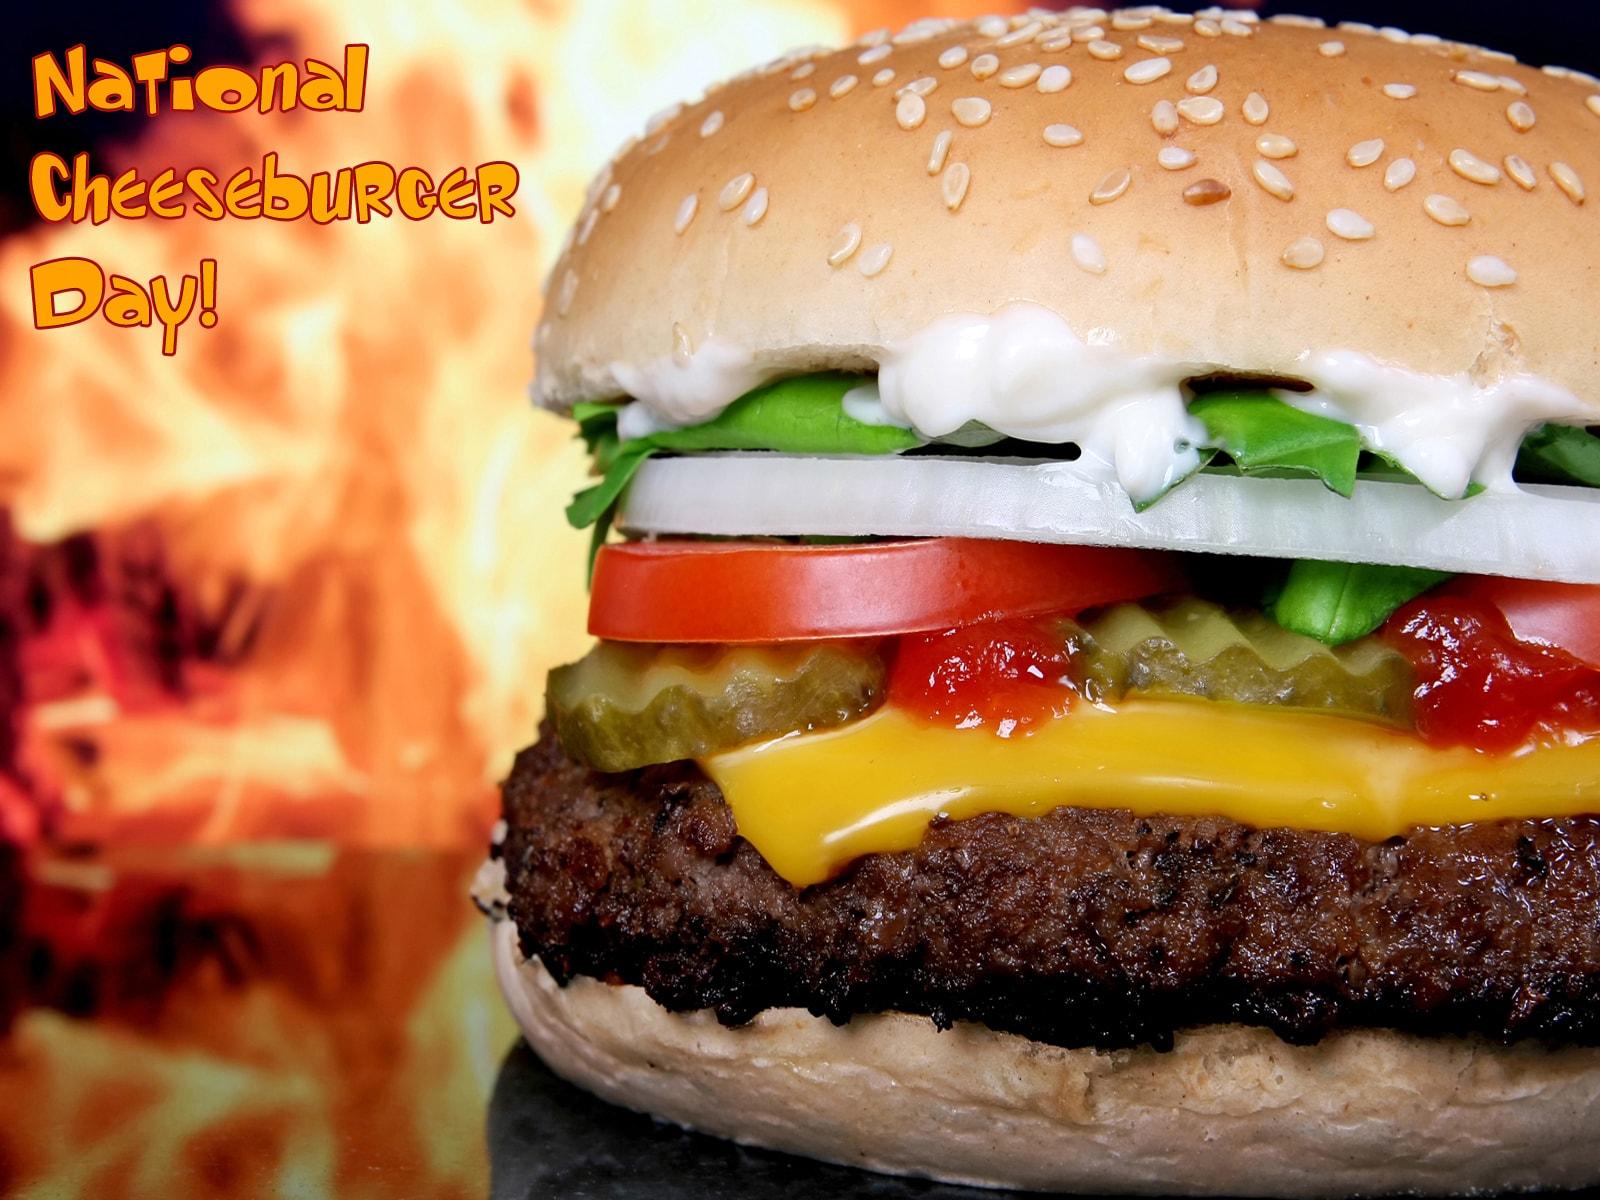 Cheeseburger Download